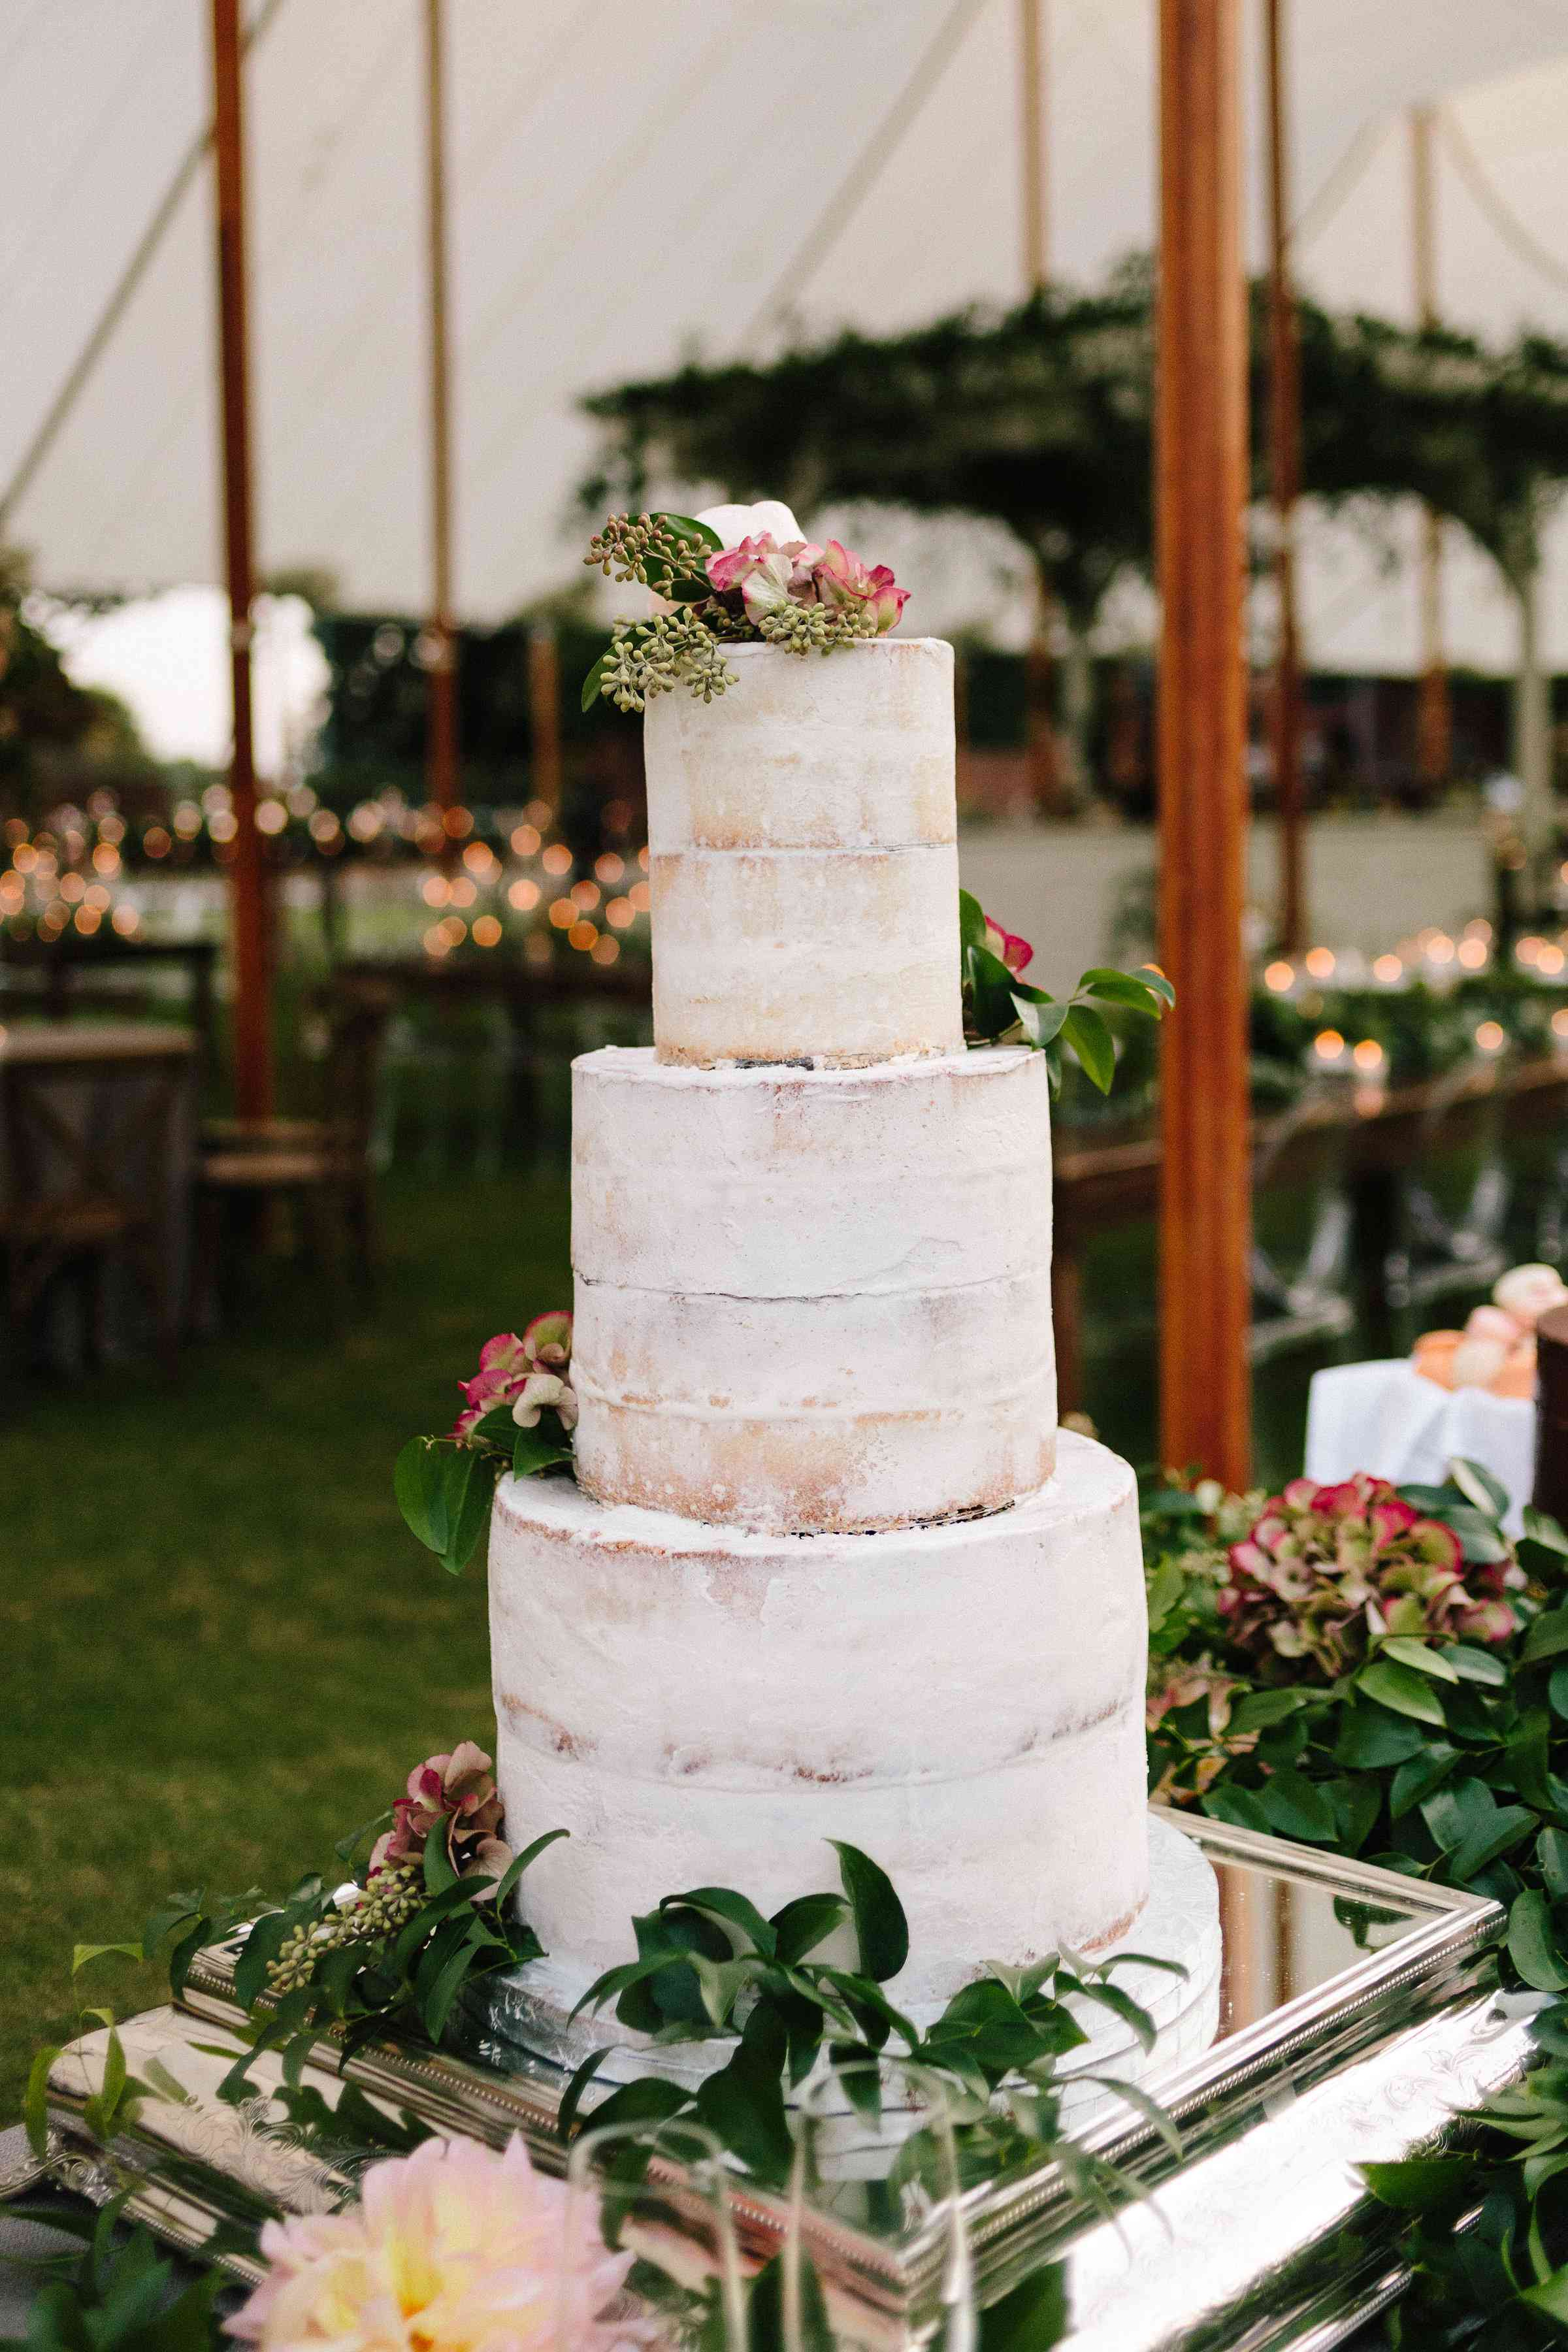 <p>semi-naked wedding cake with strawberry filling</p>